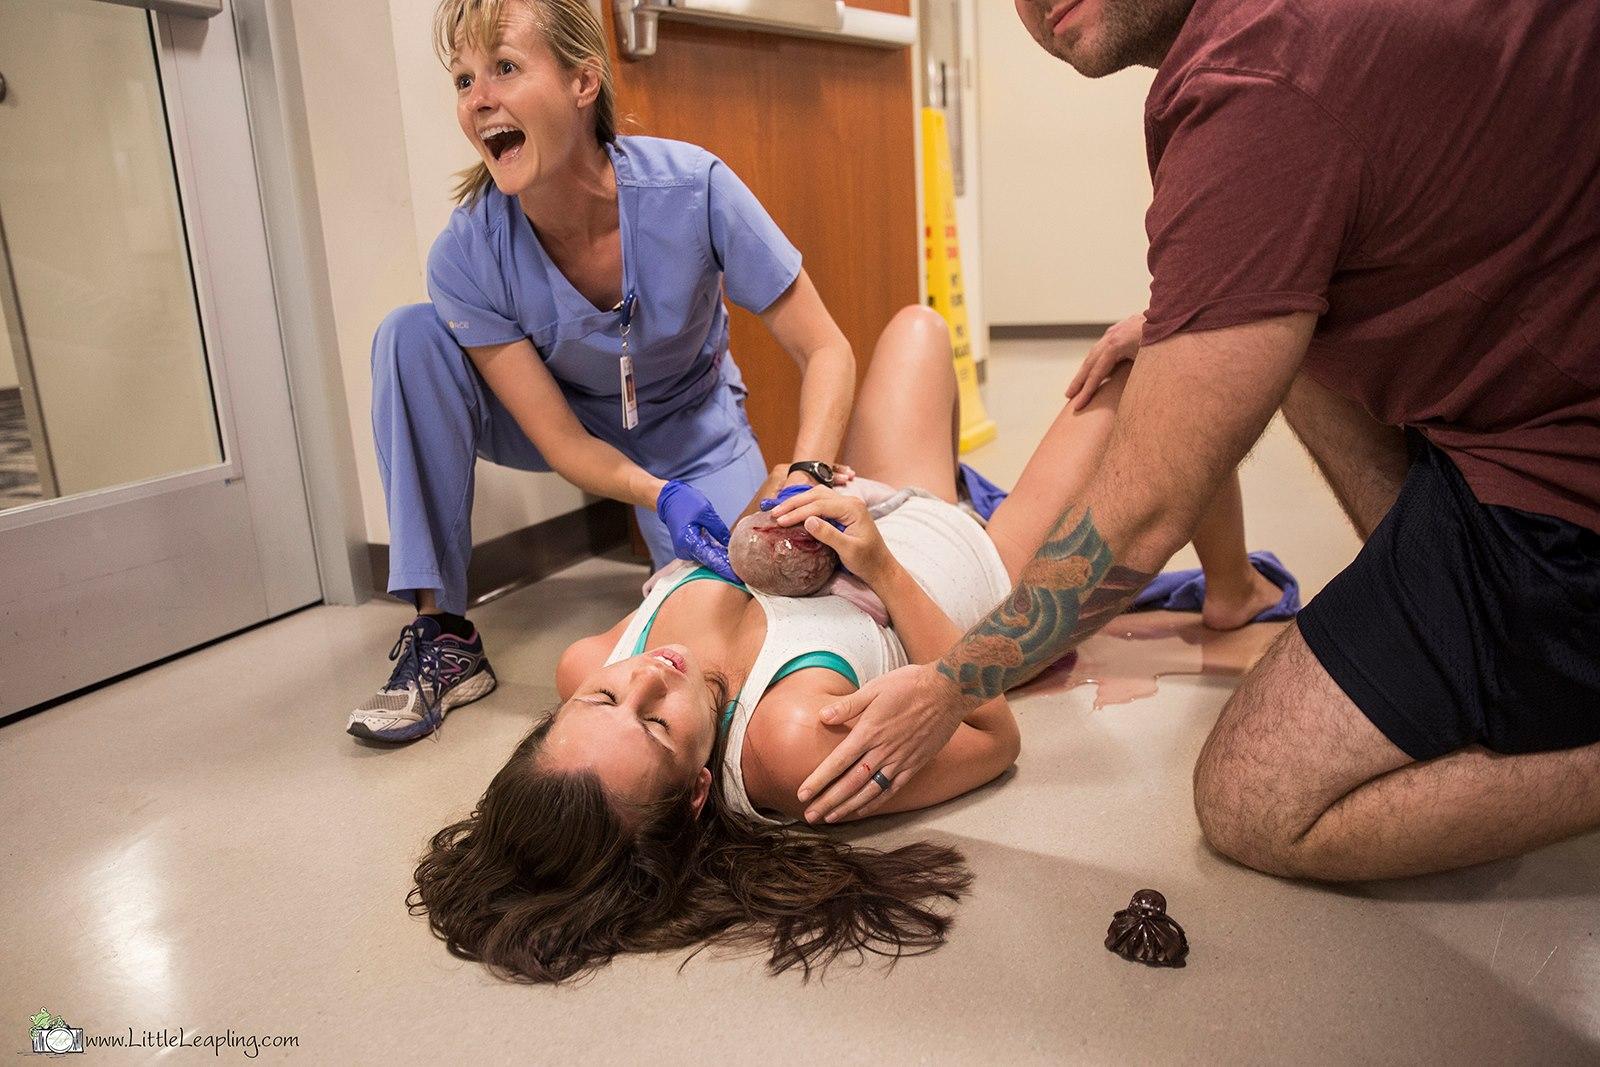 Foto nacimiento pasillo urgencias hospital 8